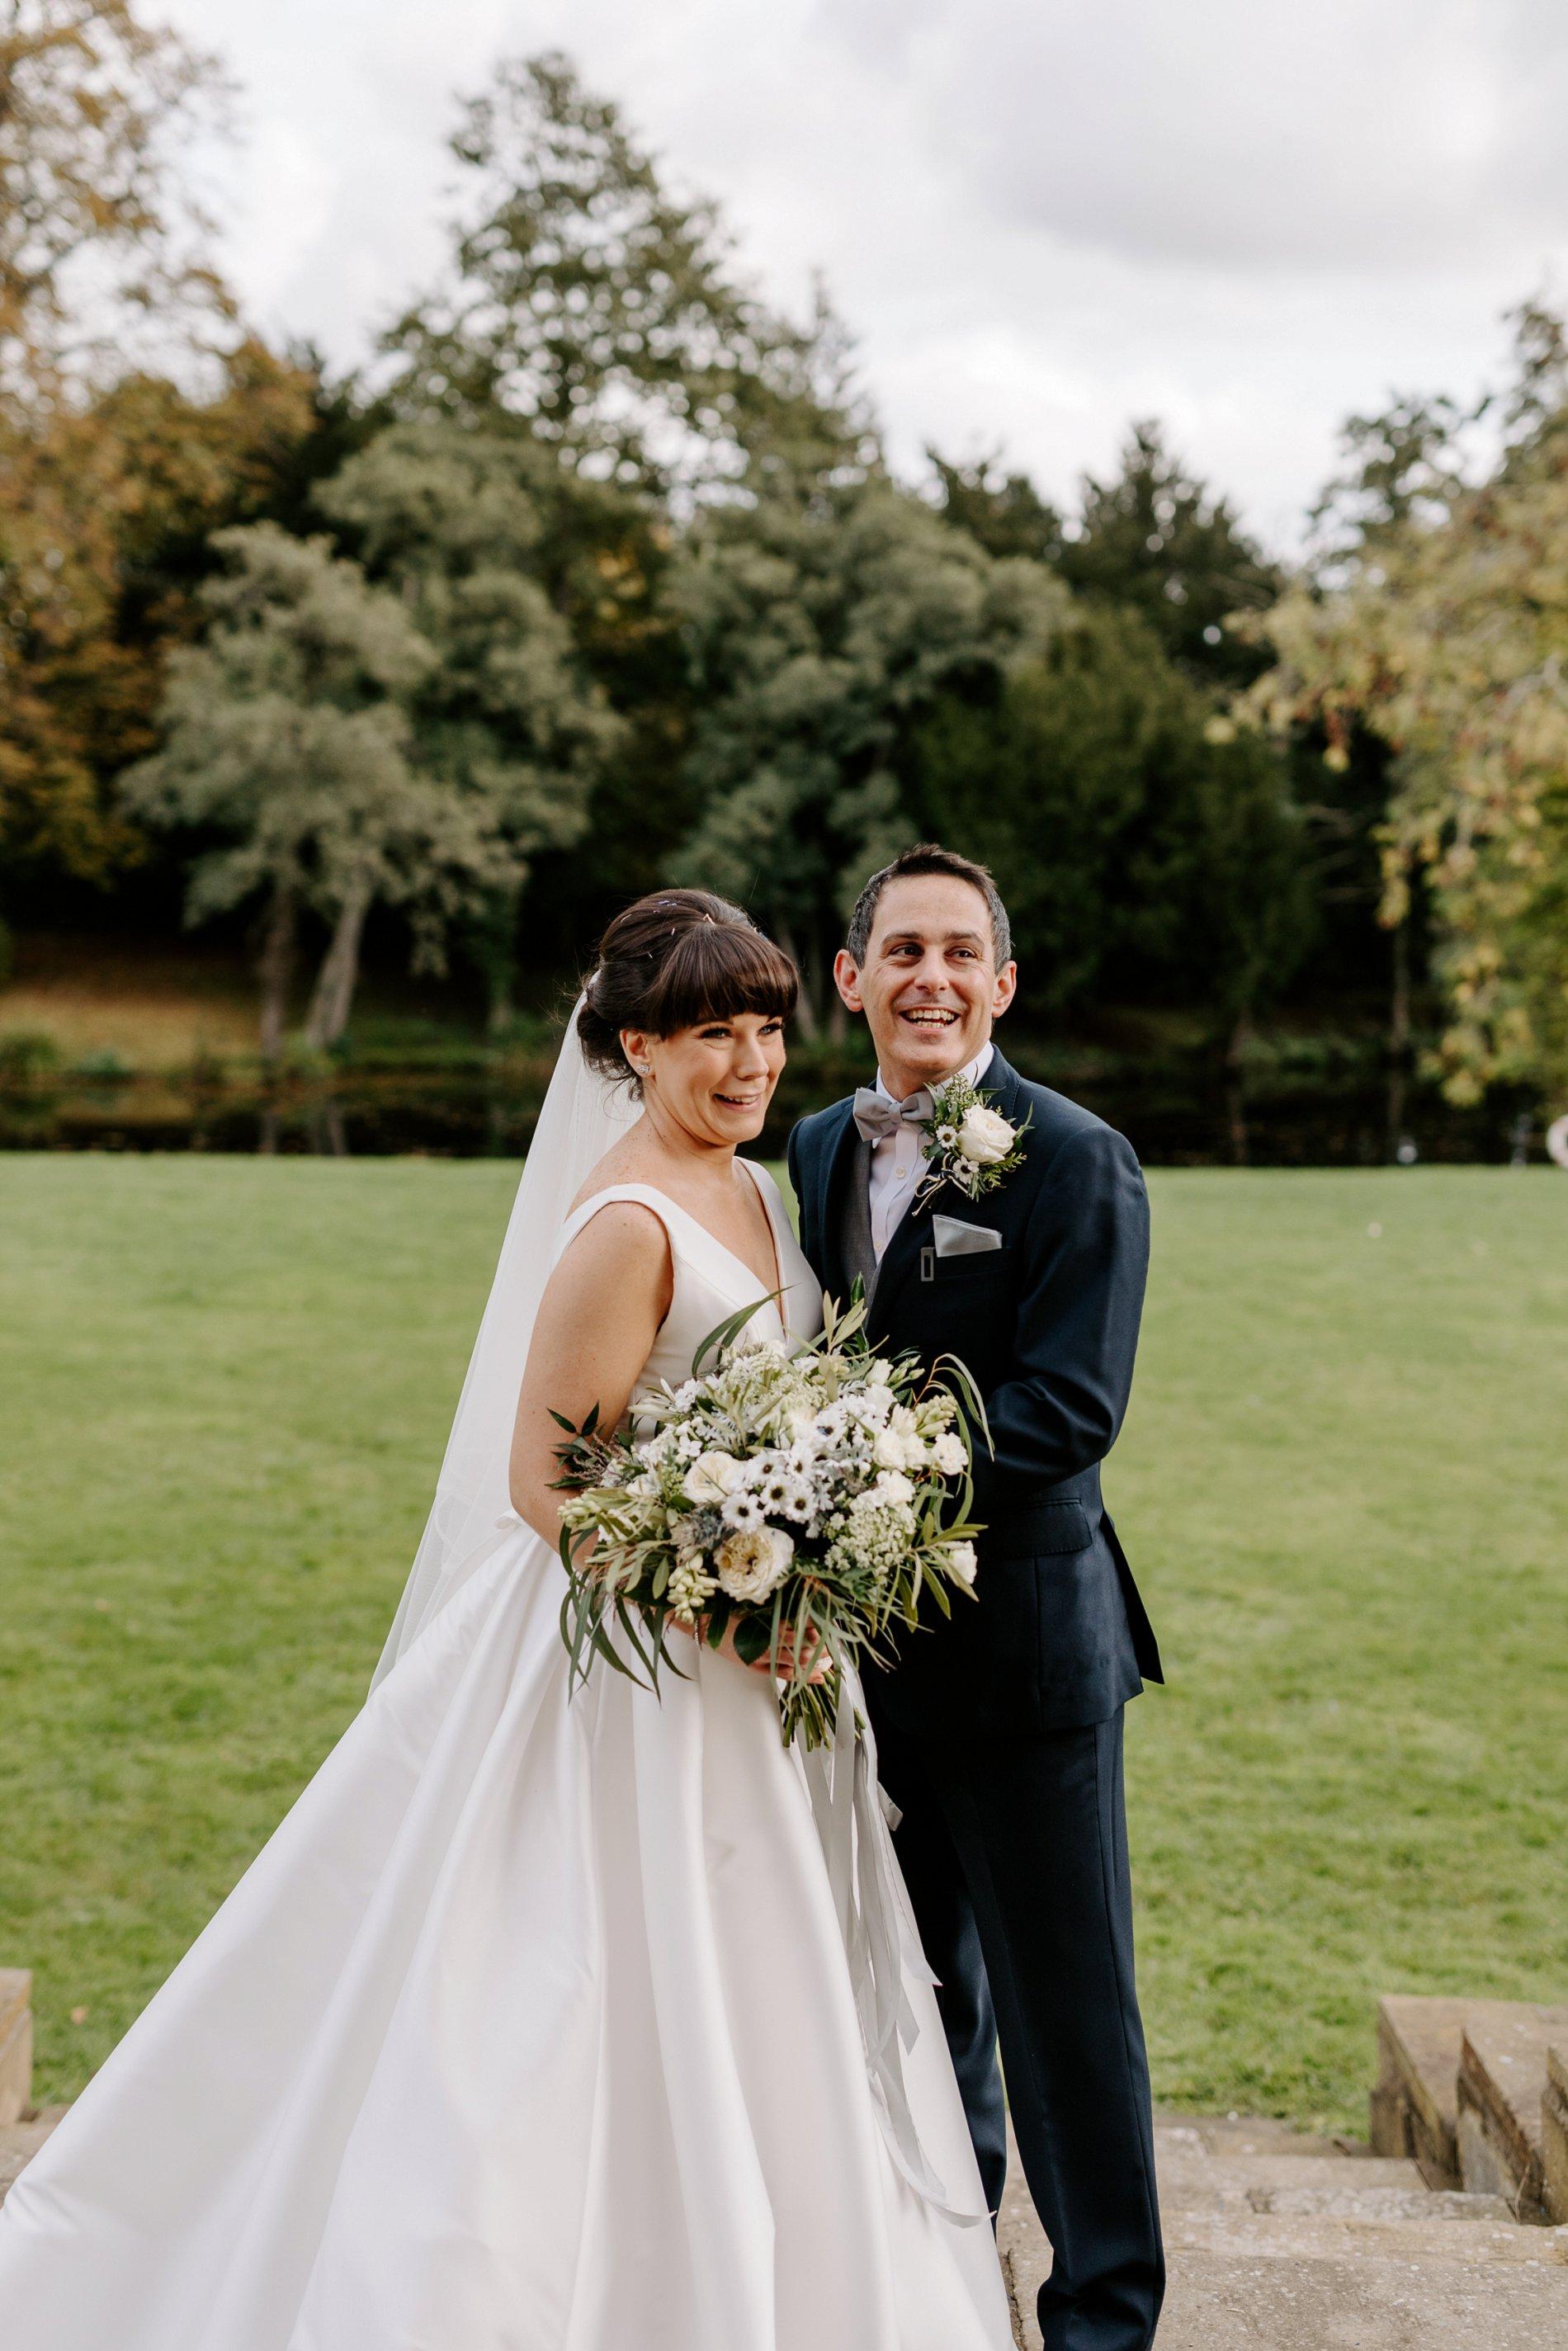 An Elegant White Wedding at Thicket Priory (c) Carla Whittingham Photography (44)